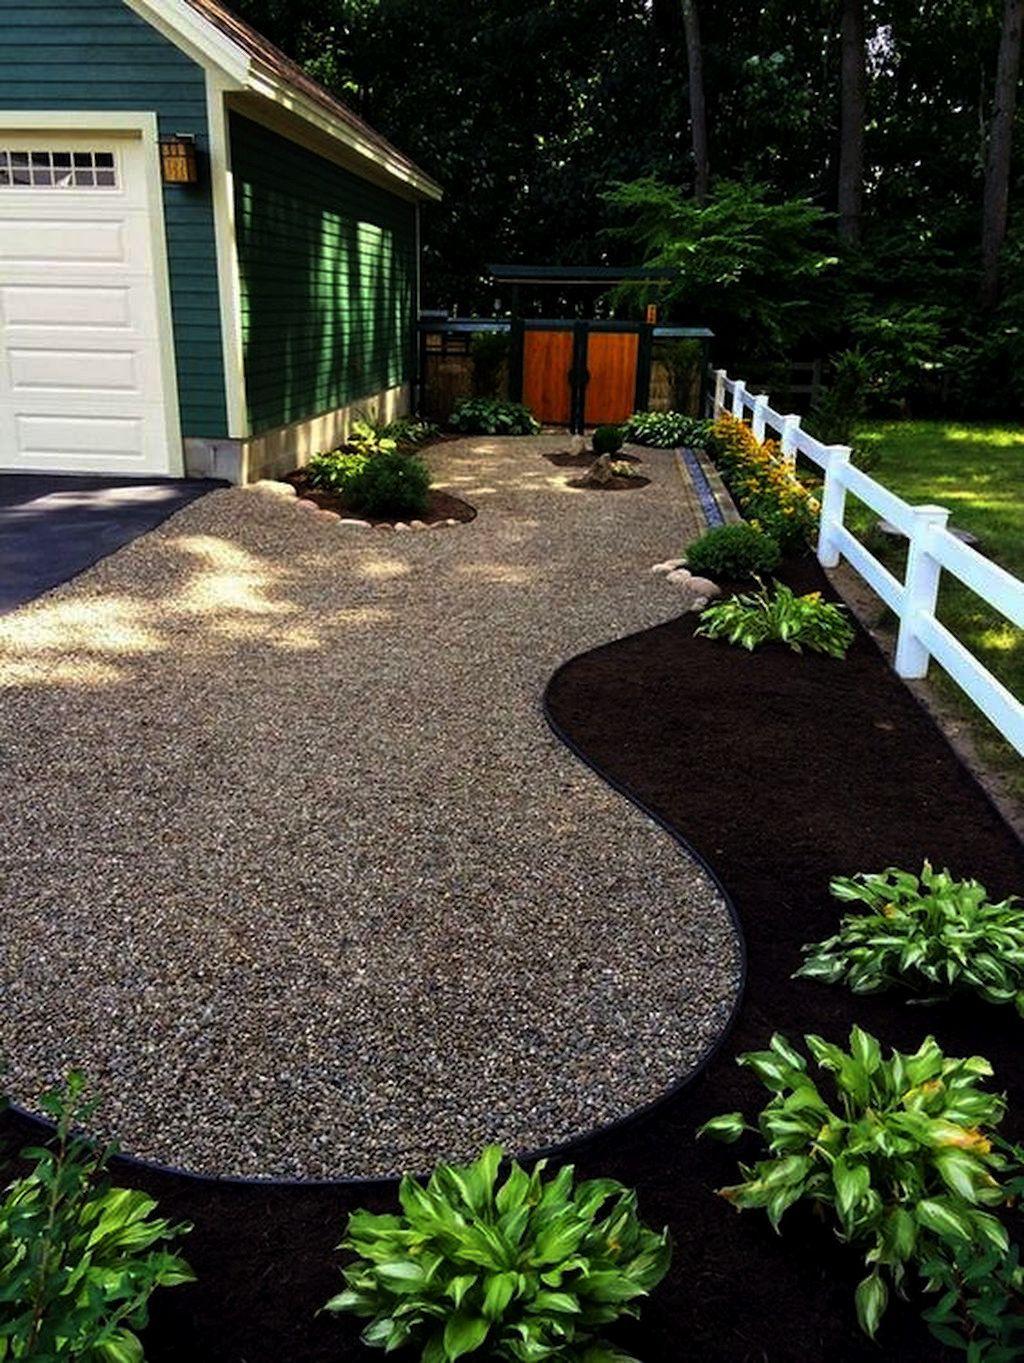 Landscape Gardening Jobs Portishead, Landscape Gardening ...